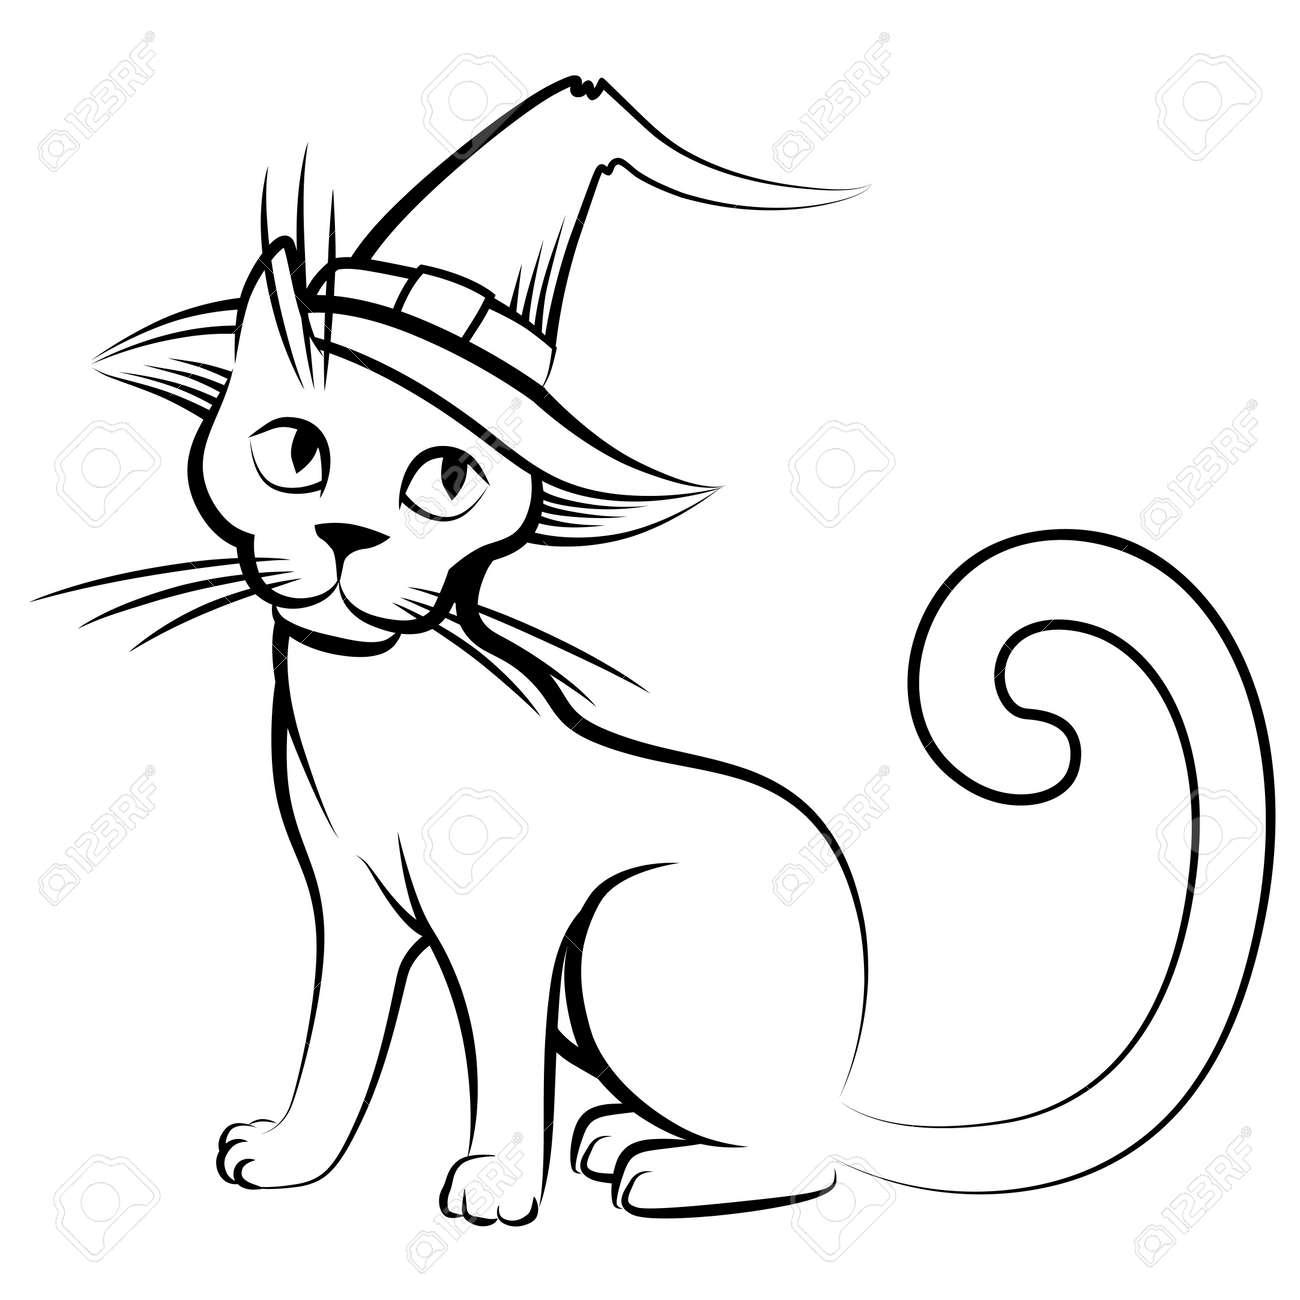 05dc8287 Vector isolated illustrations of cartoon Halloween cat in hat Stock Vector  - 47963918